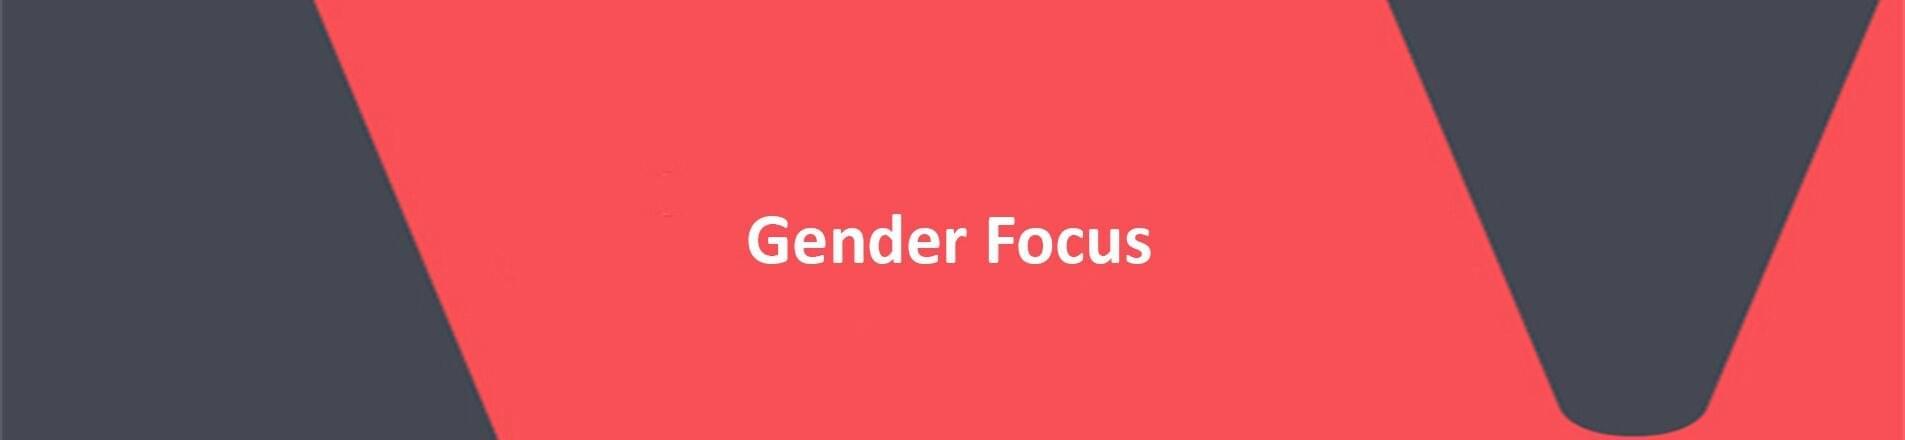 Gender Focus.